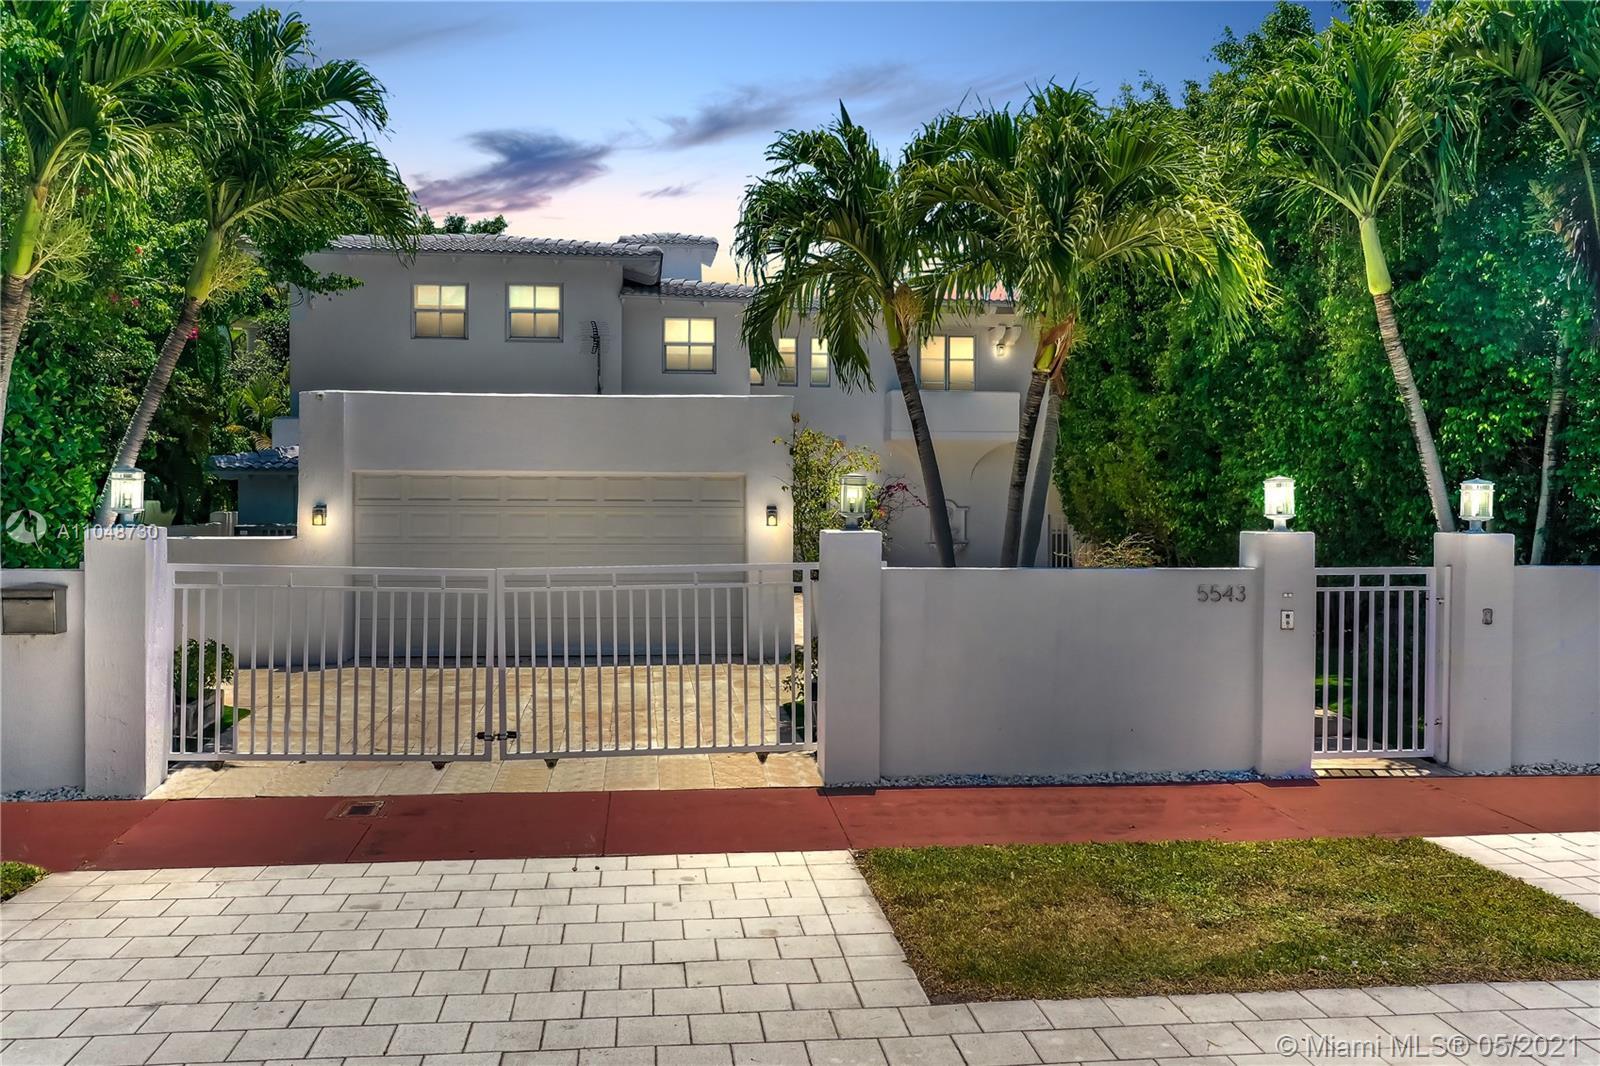 Beach View - 5543 La Gorce Dr, Miami Beach, FL 33140